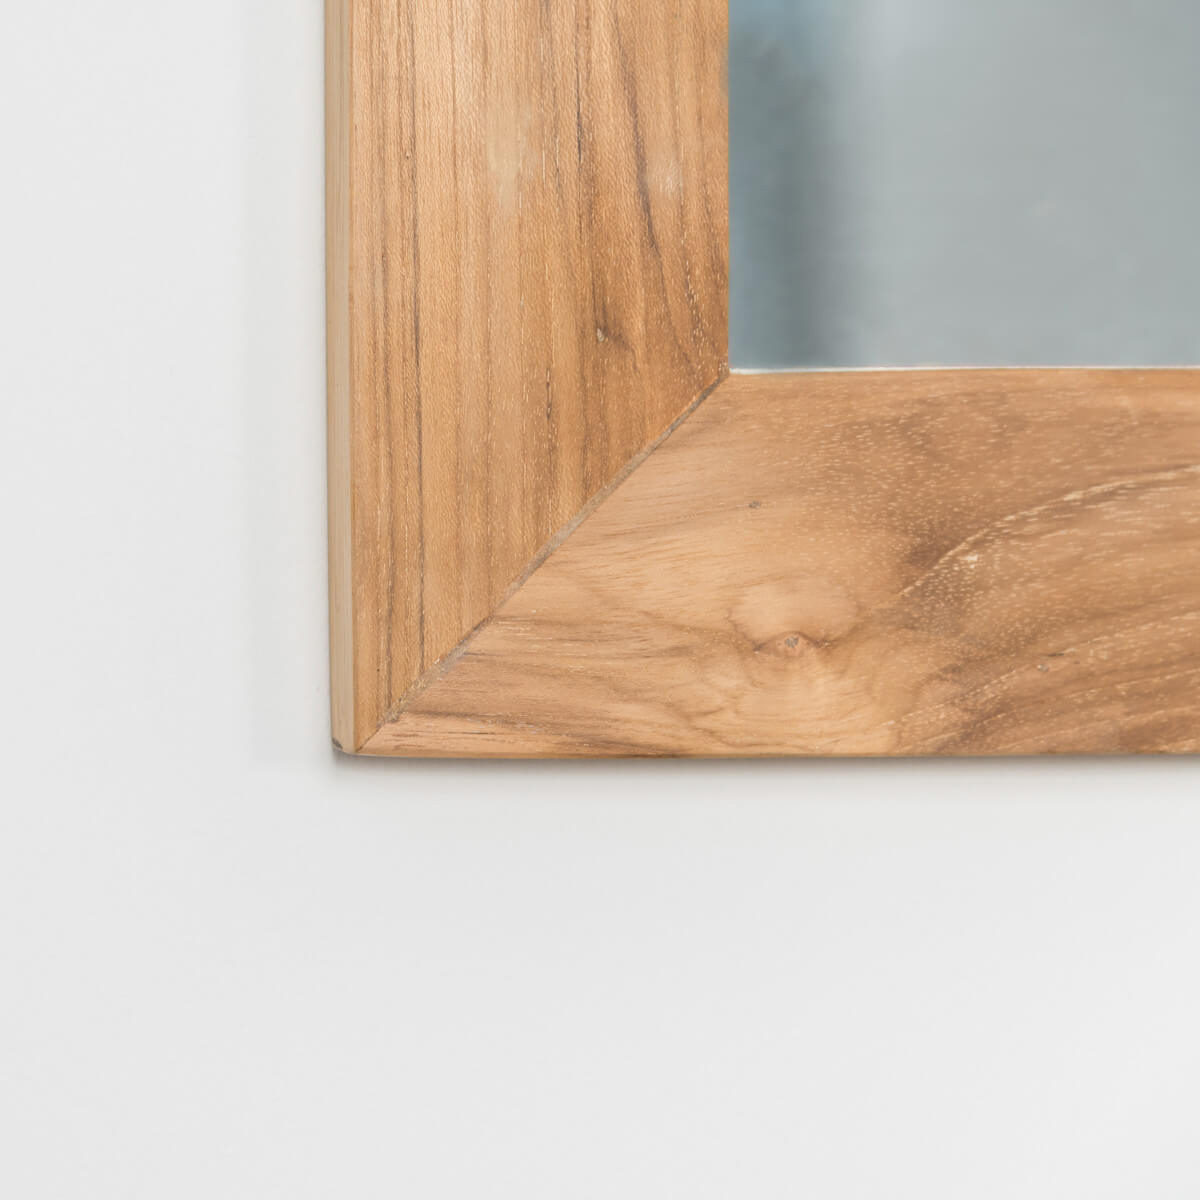 Espejo rectangular grande de teca maciza 180 x 70 for Espejo rectangular grande